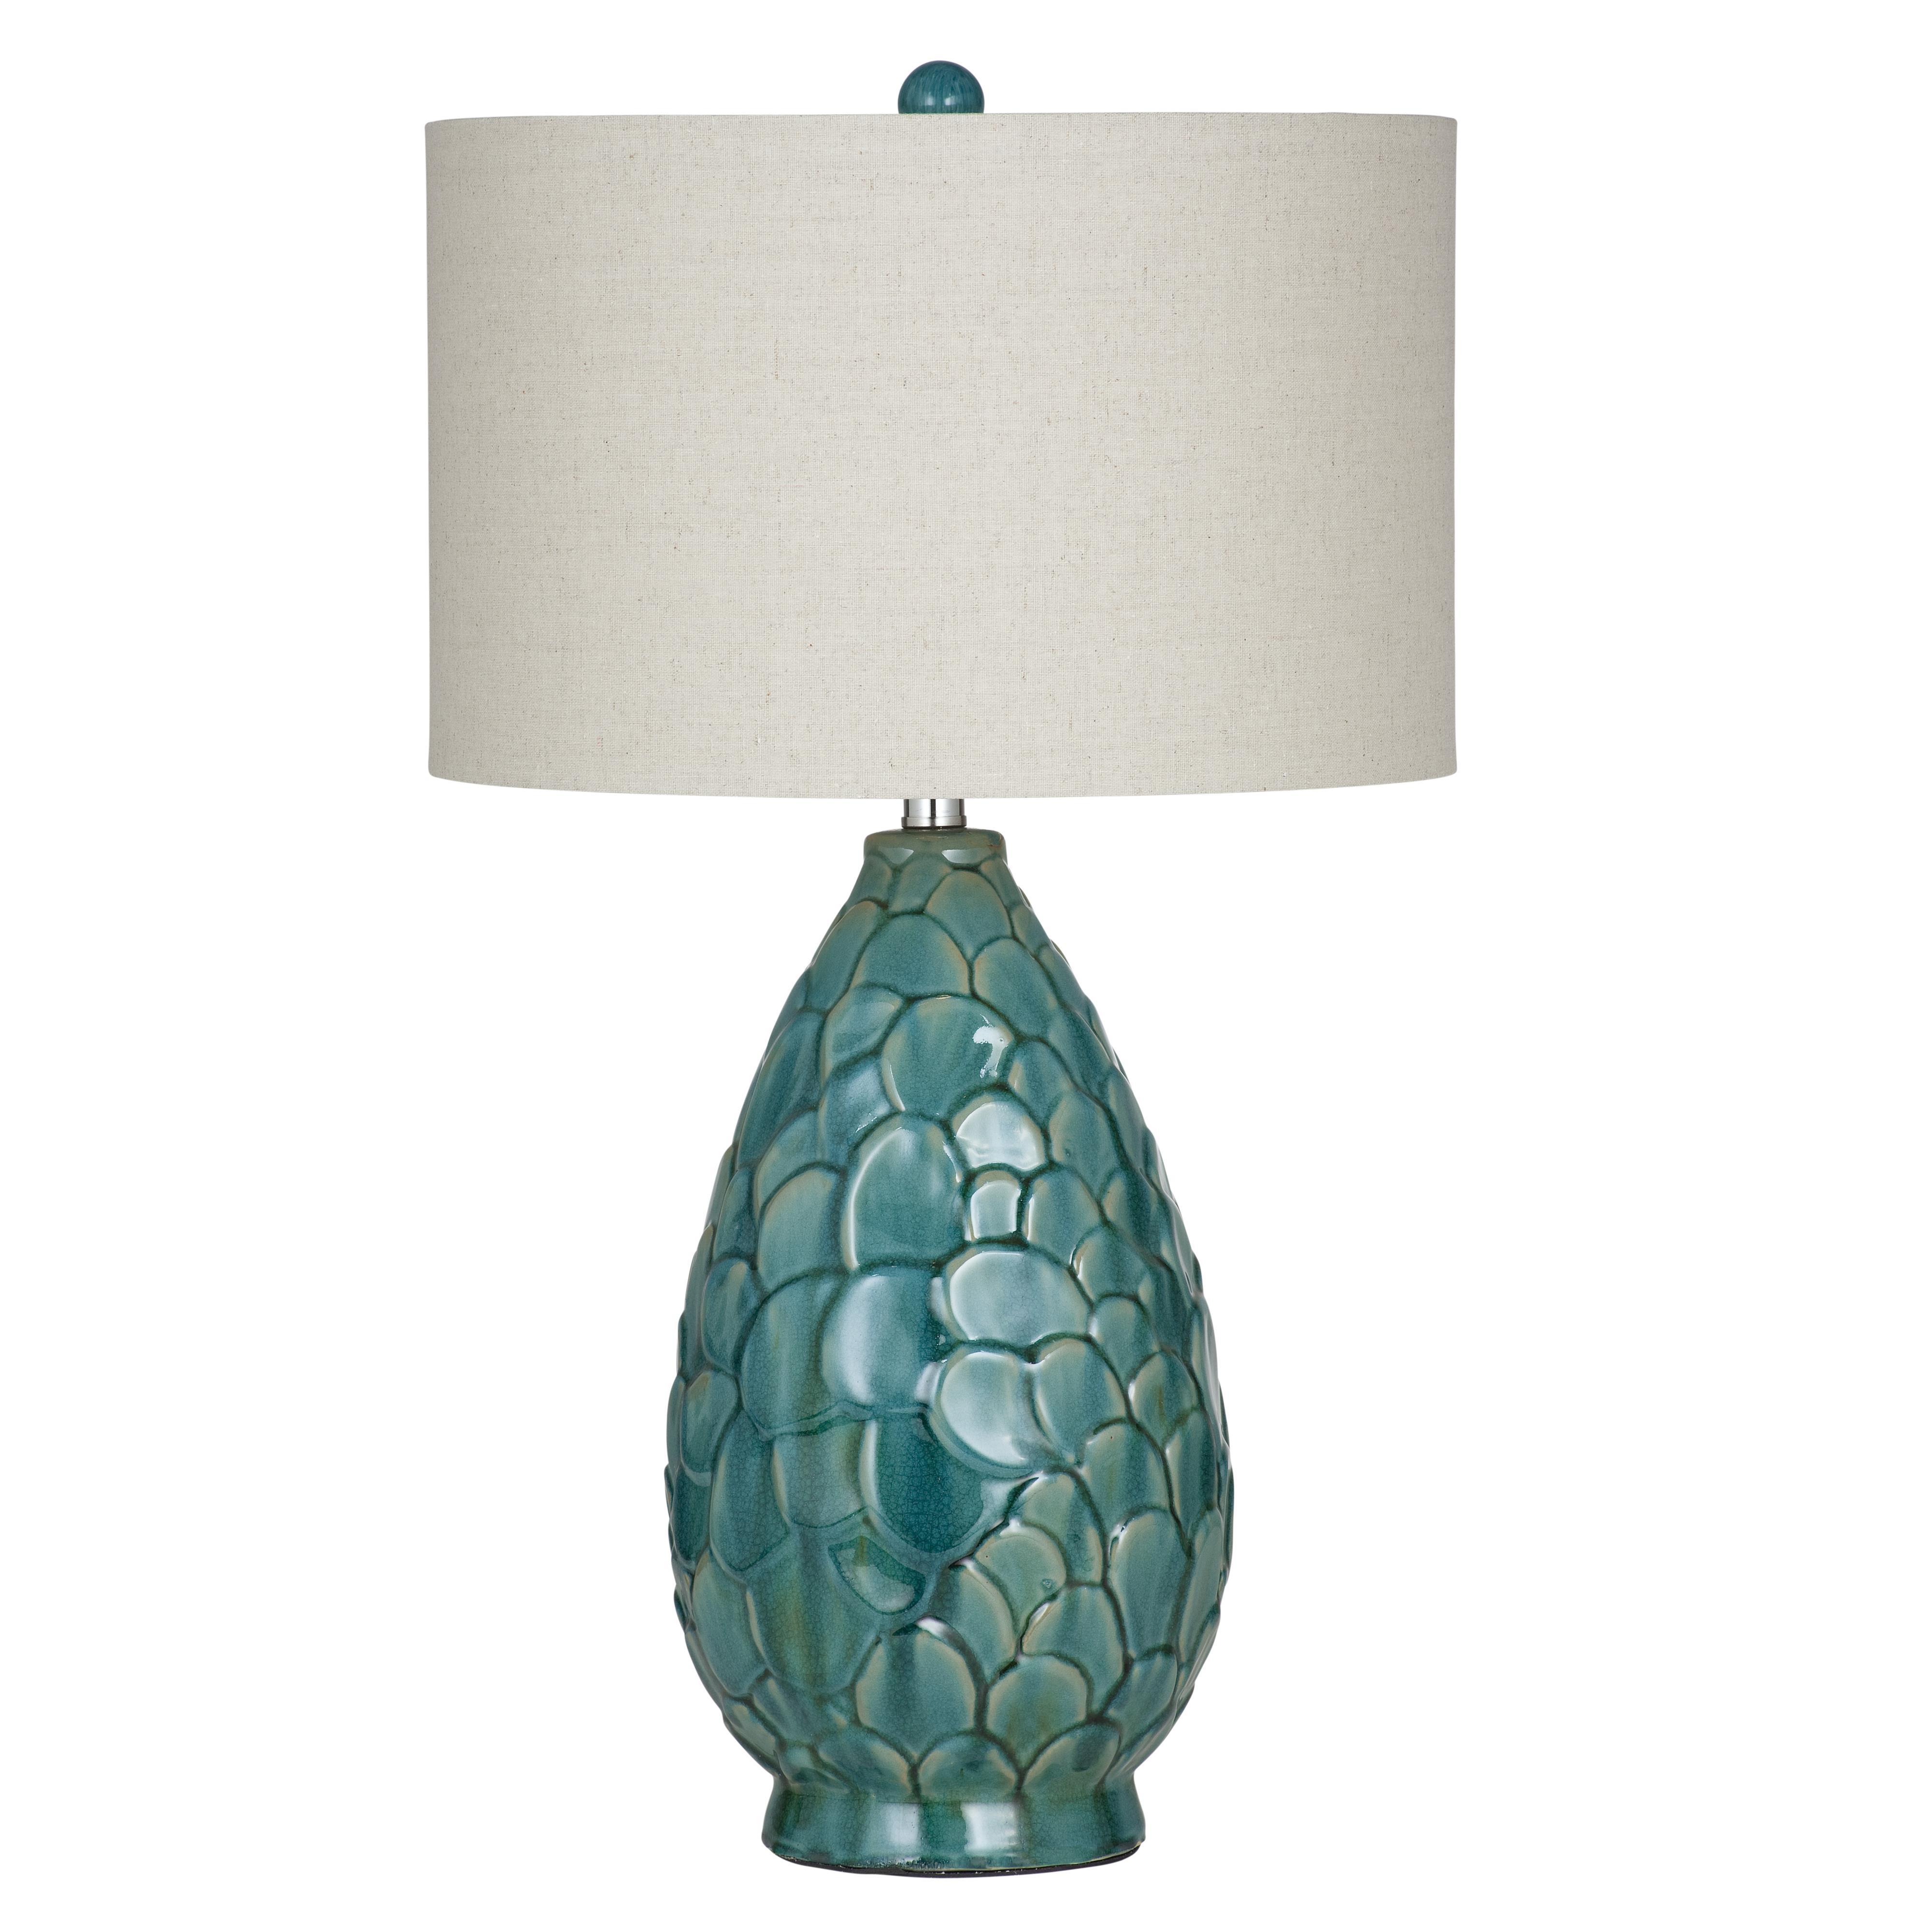 Pan Pacific Sorento Table Lamp by Bassett Mirror at Alison Craig Home Furnishings